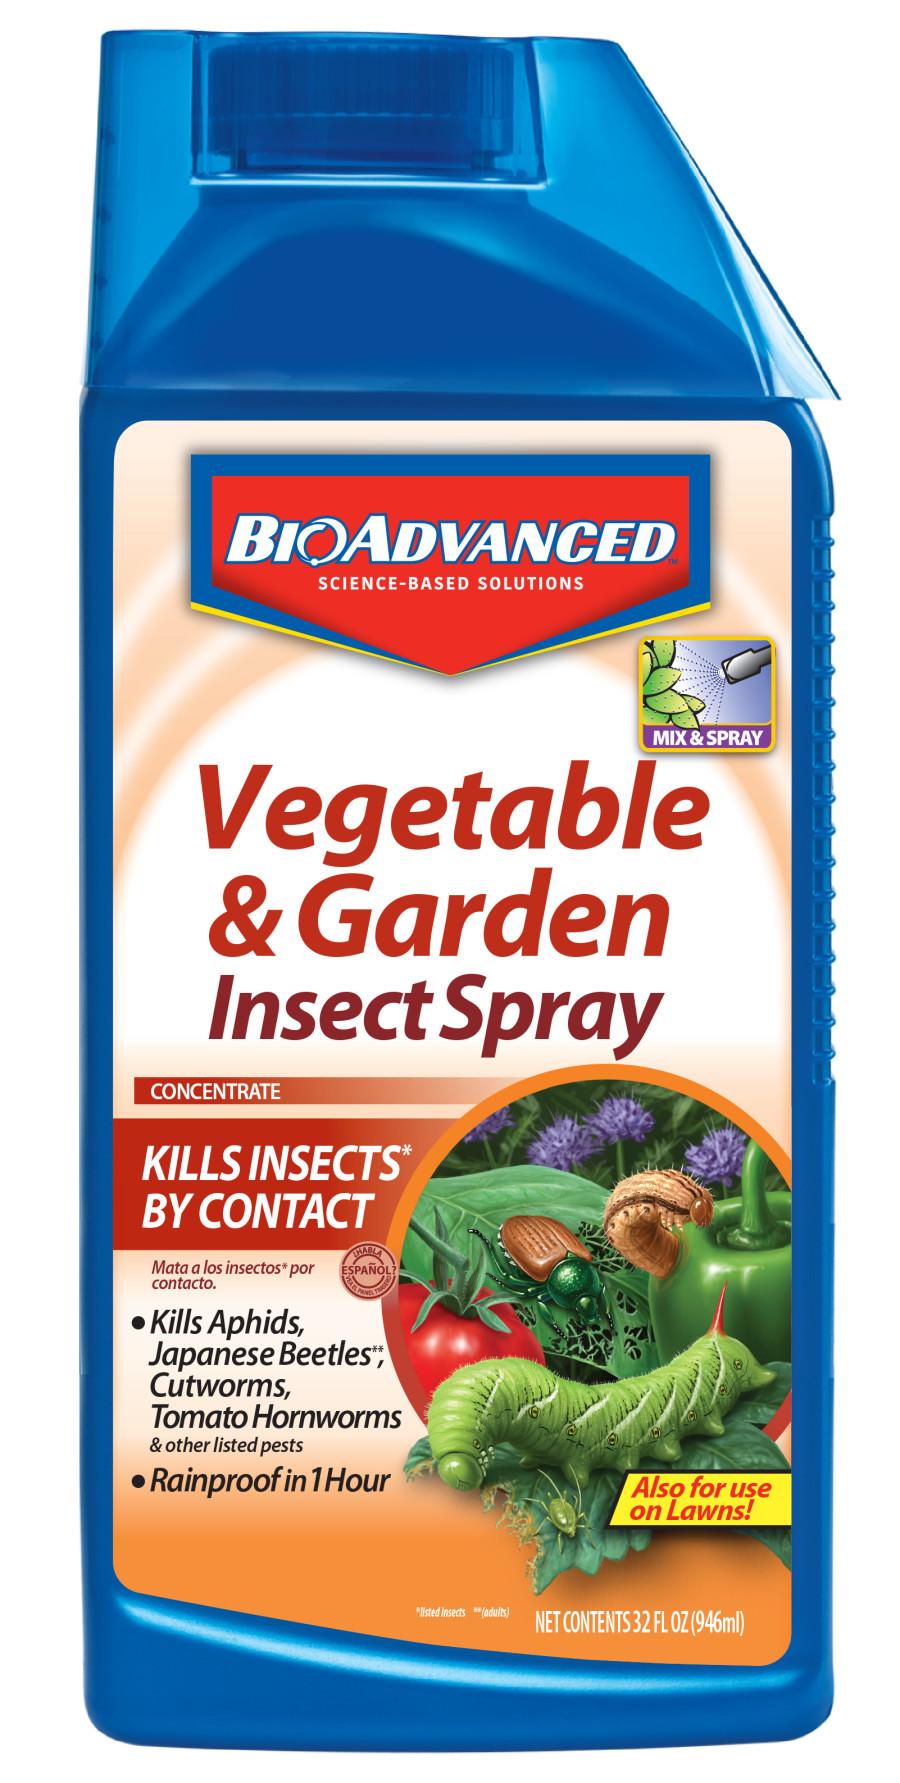 BioAdvanced Vegetable & Garden Insect Spray Concentrate 8ea/32 fl oz